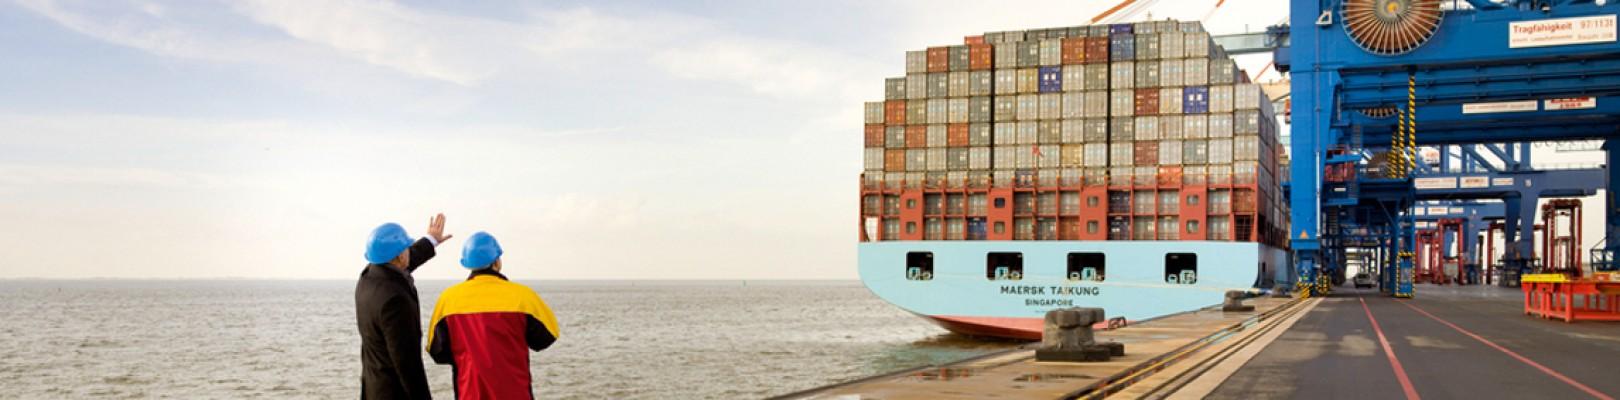 Transgourmet Export